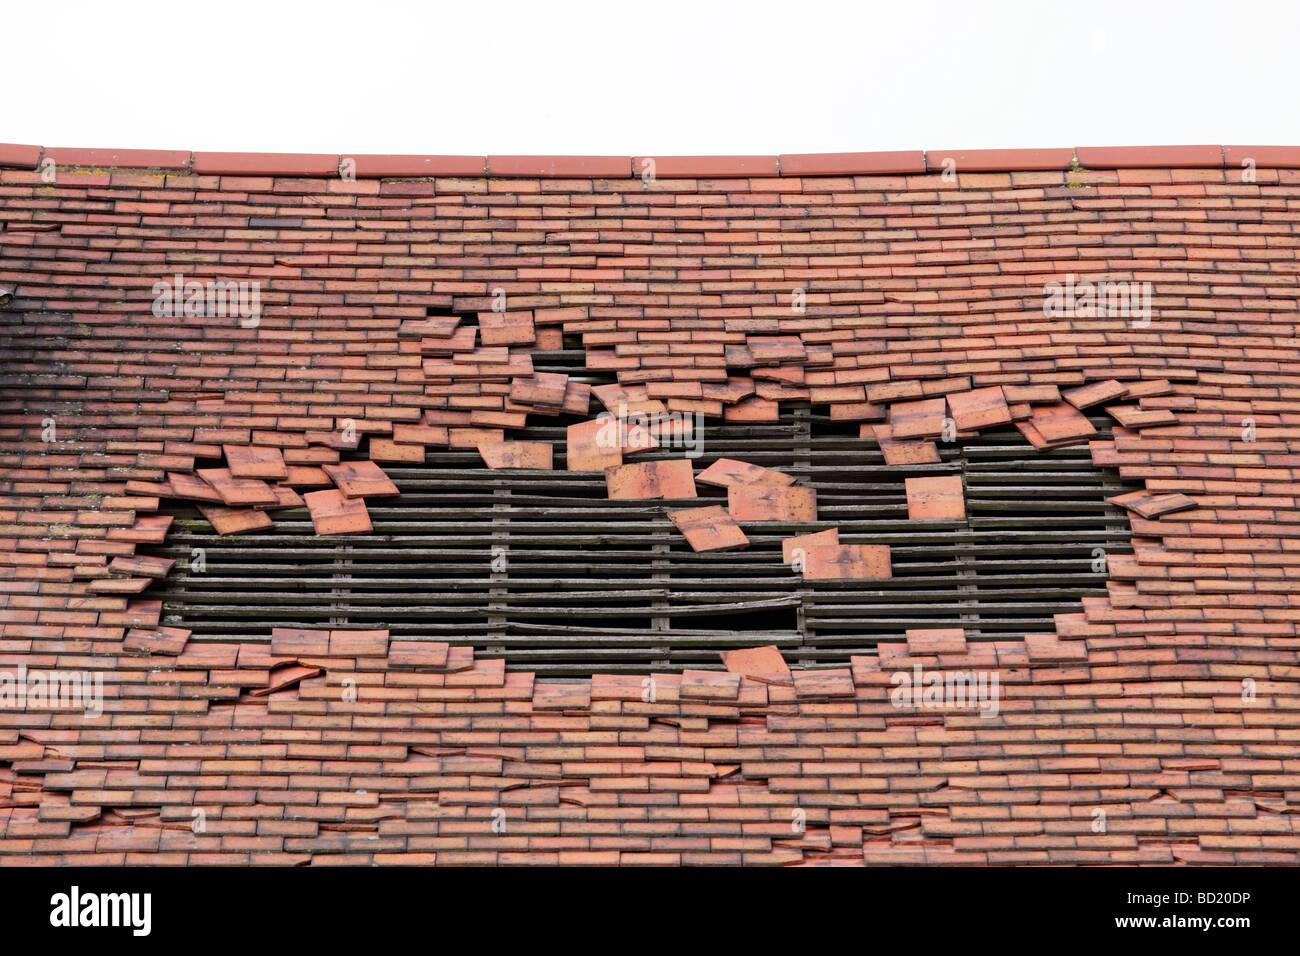 Damaged Roof Tiles Stock Photos Amp Damaged Roof Tiles Stock